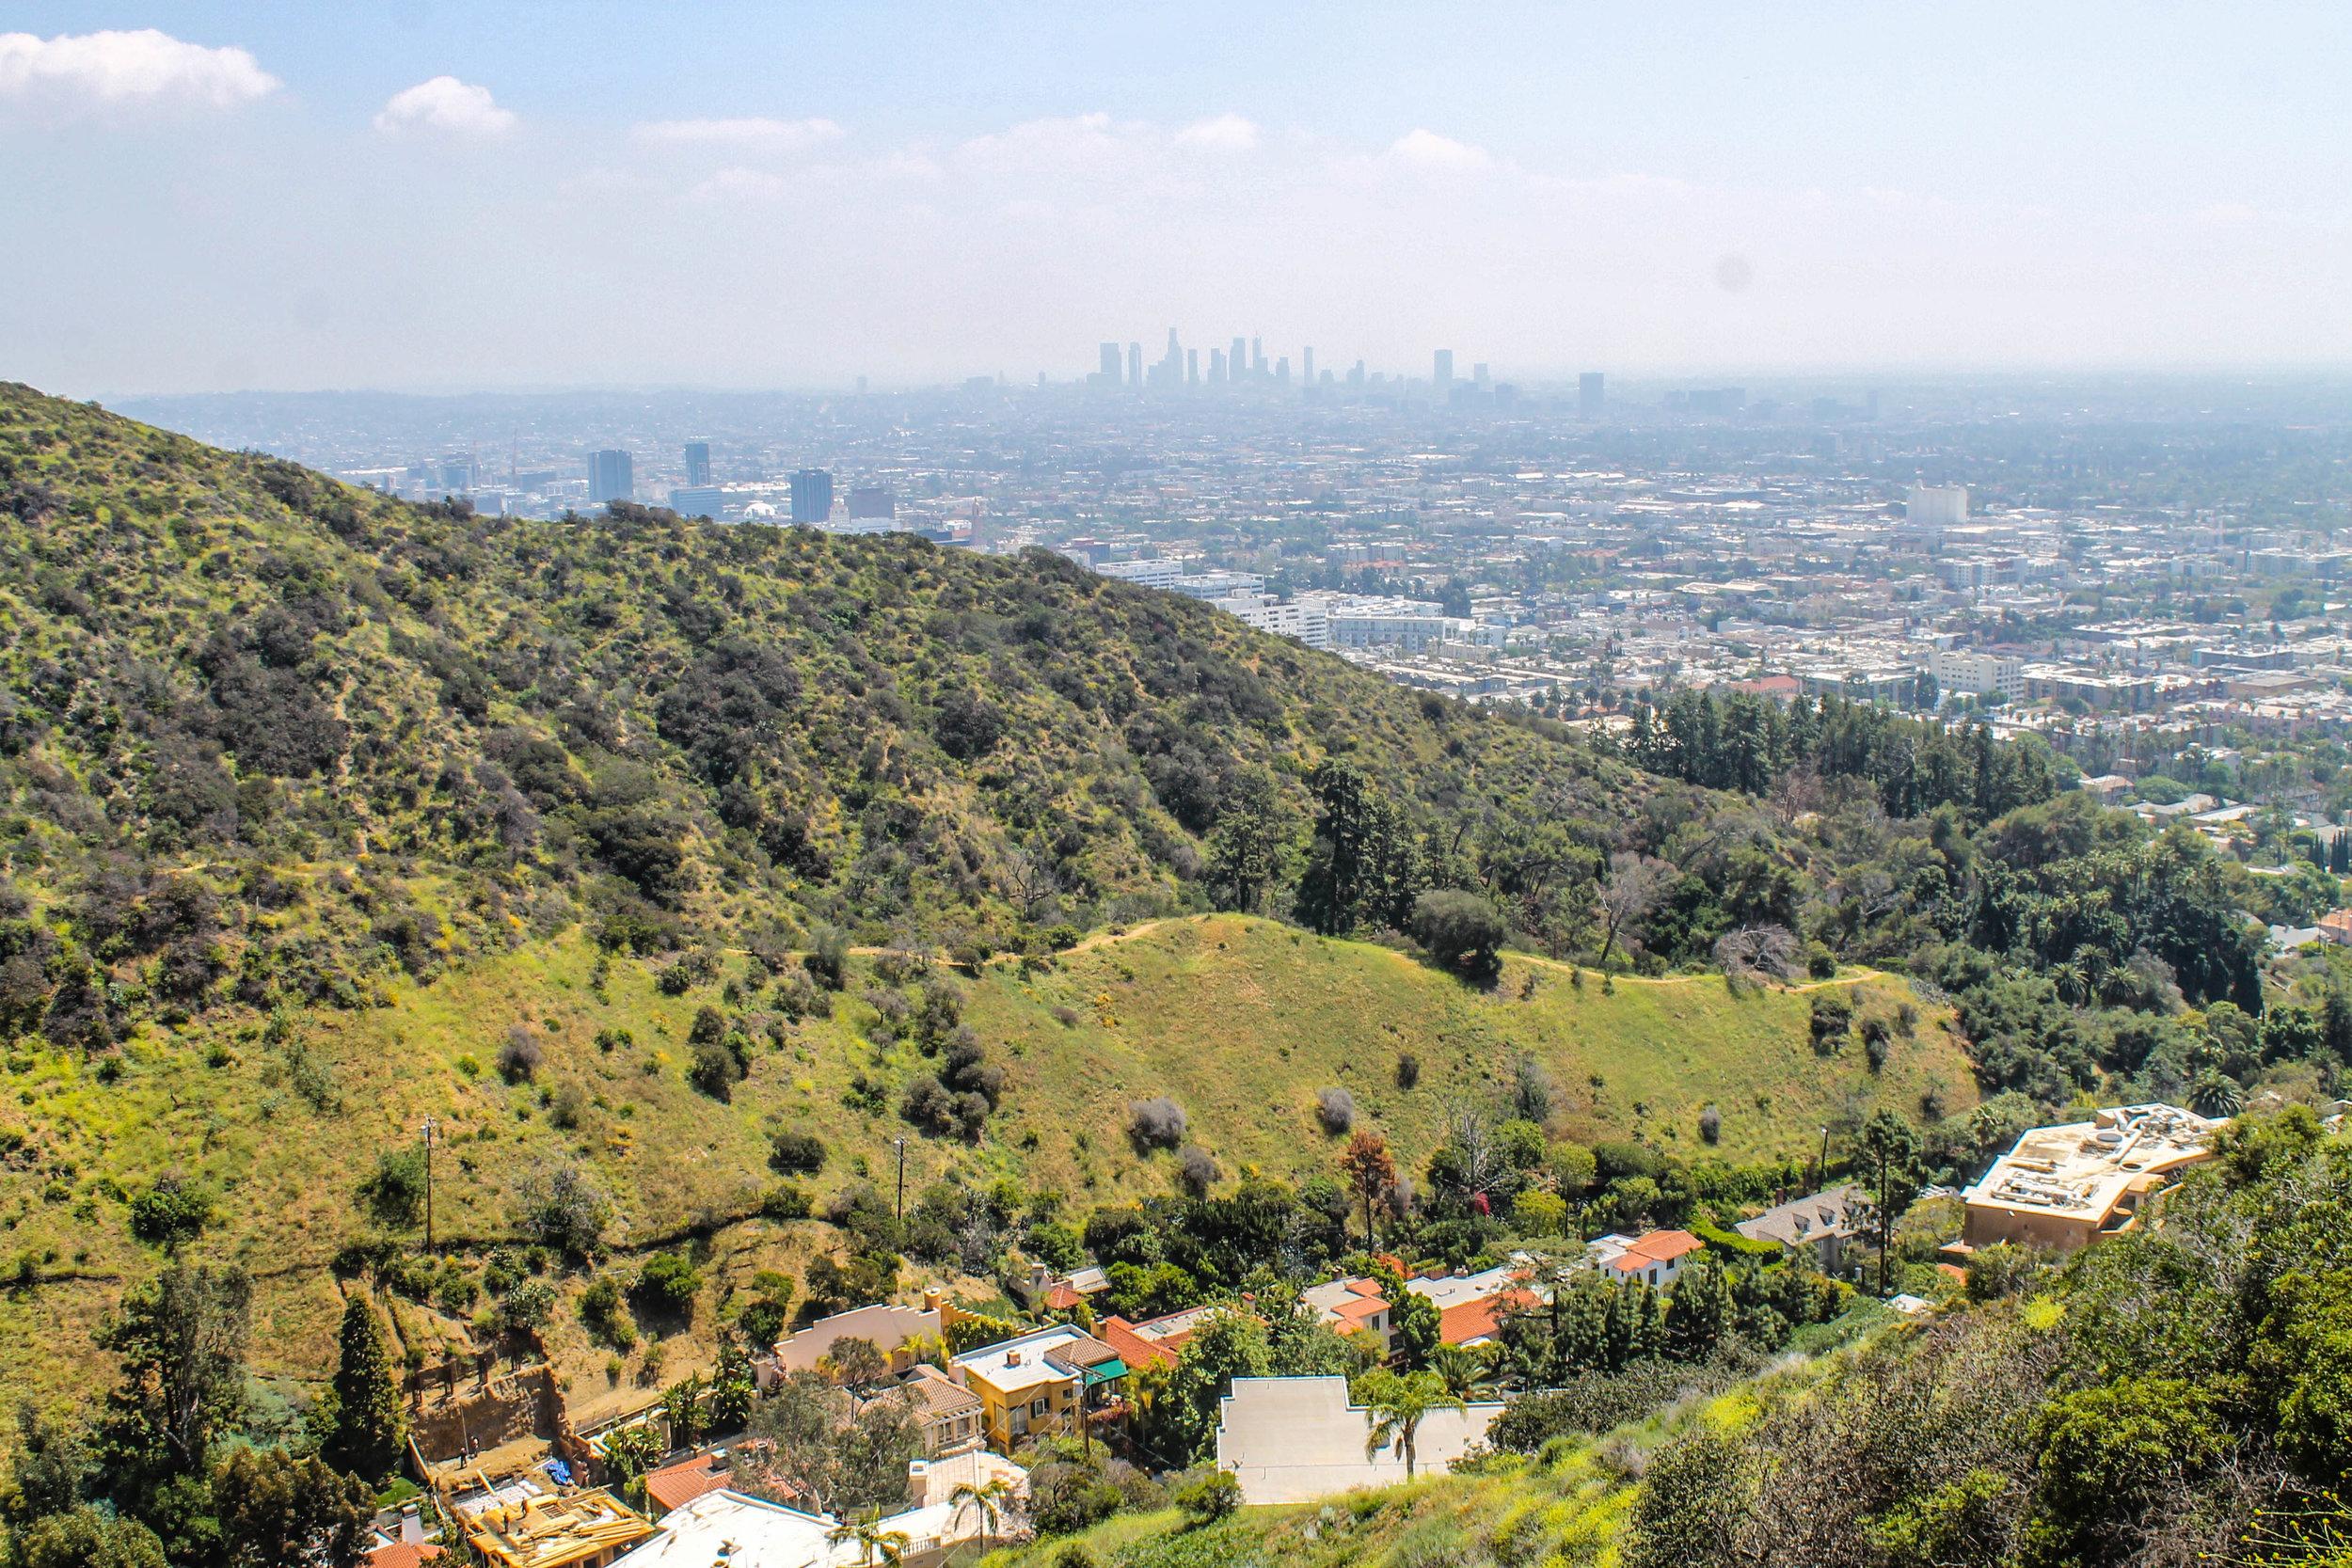 LA Hills